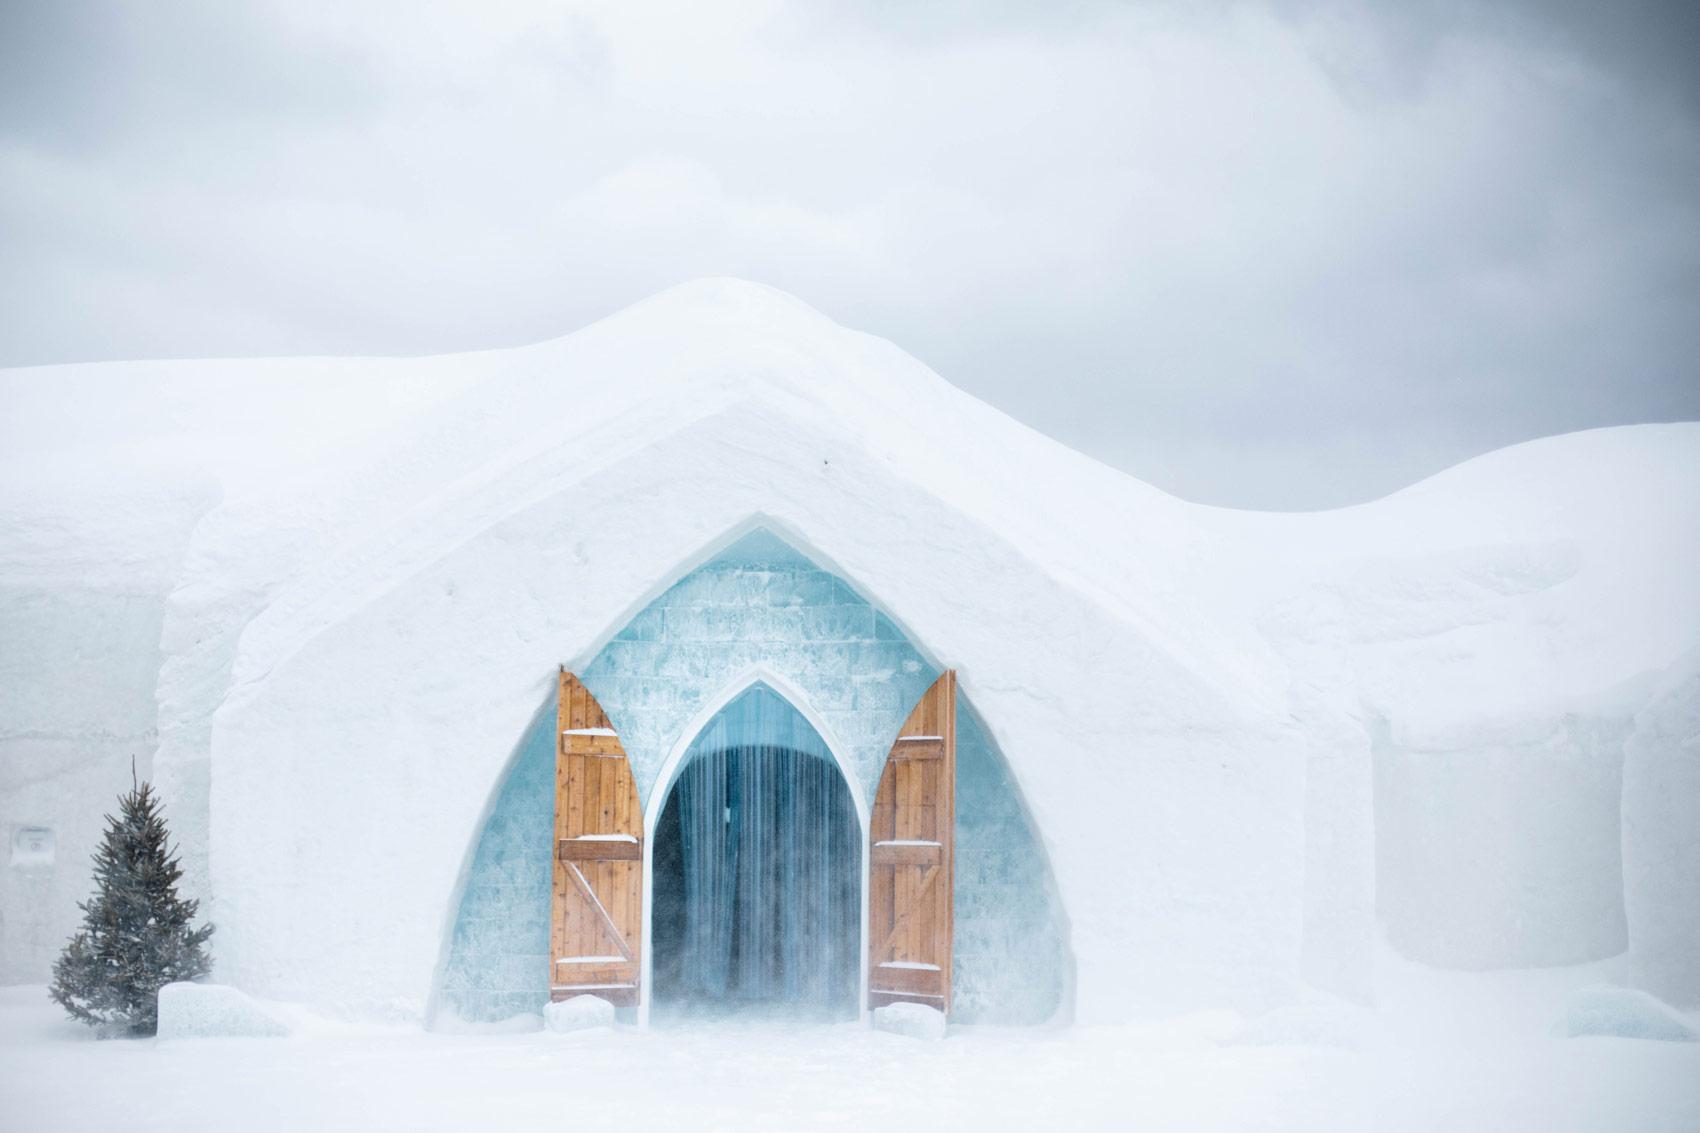 visite-hotel-de-glace-quebec-hiver